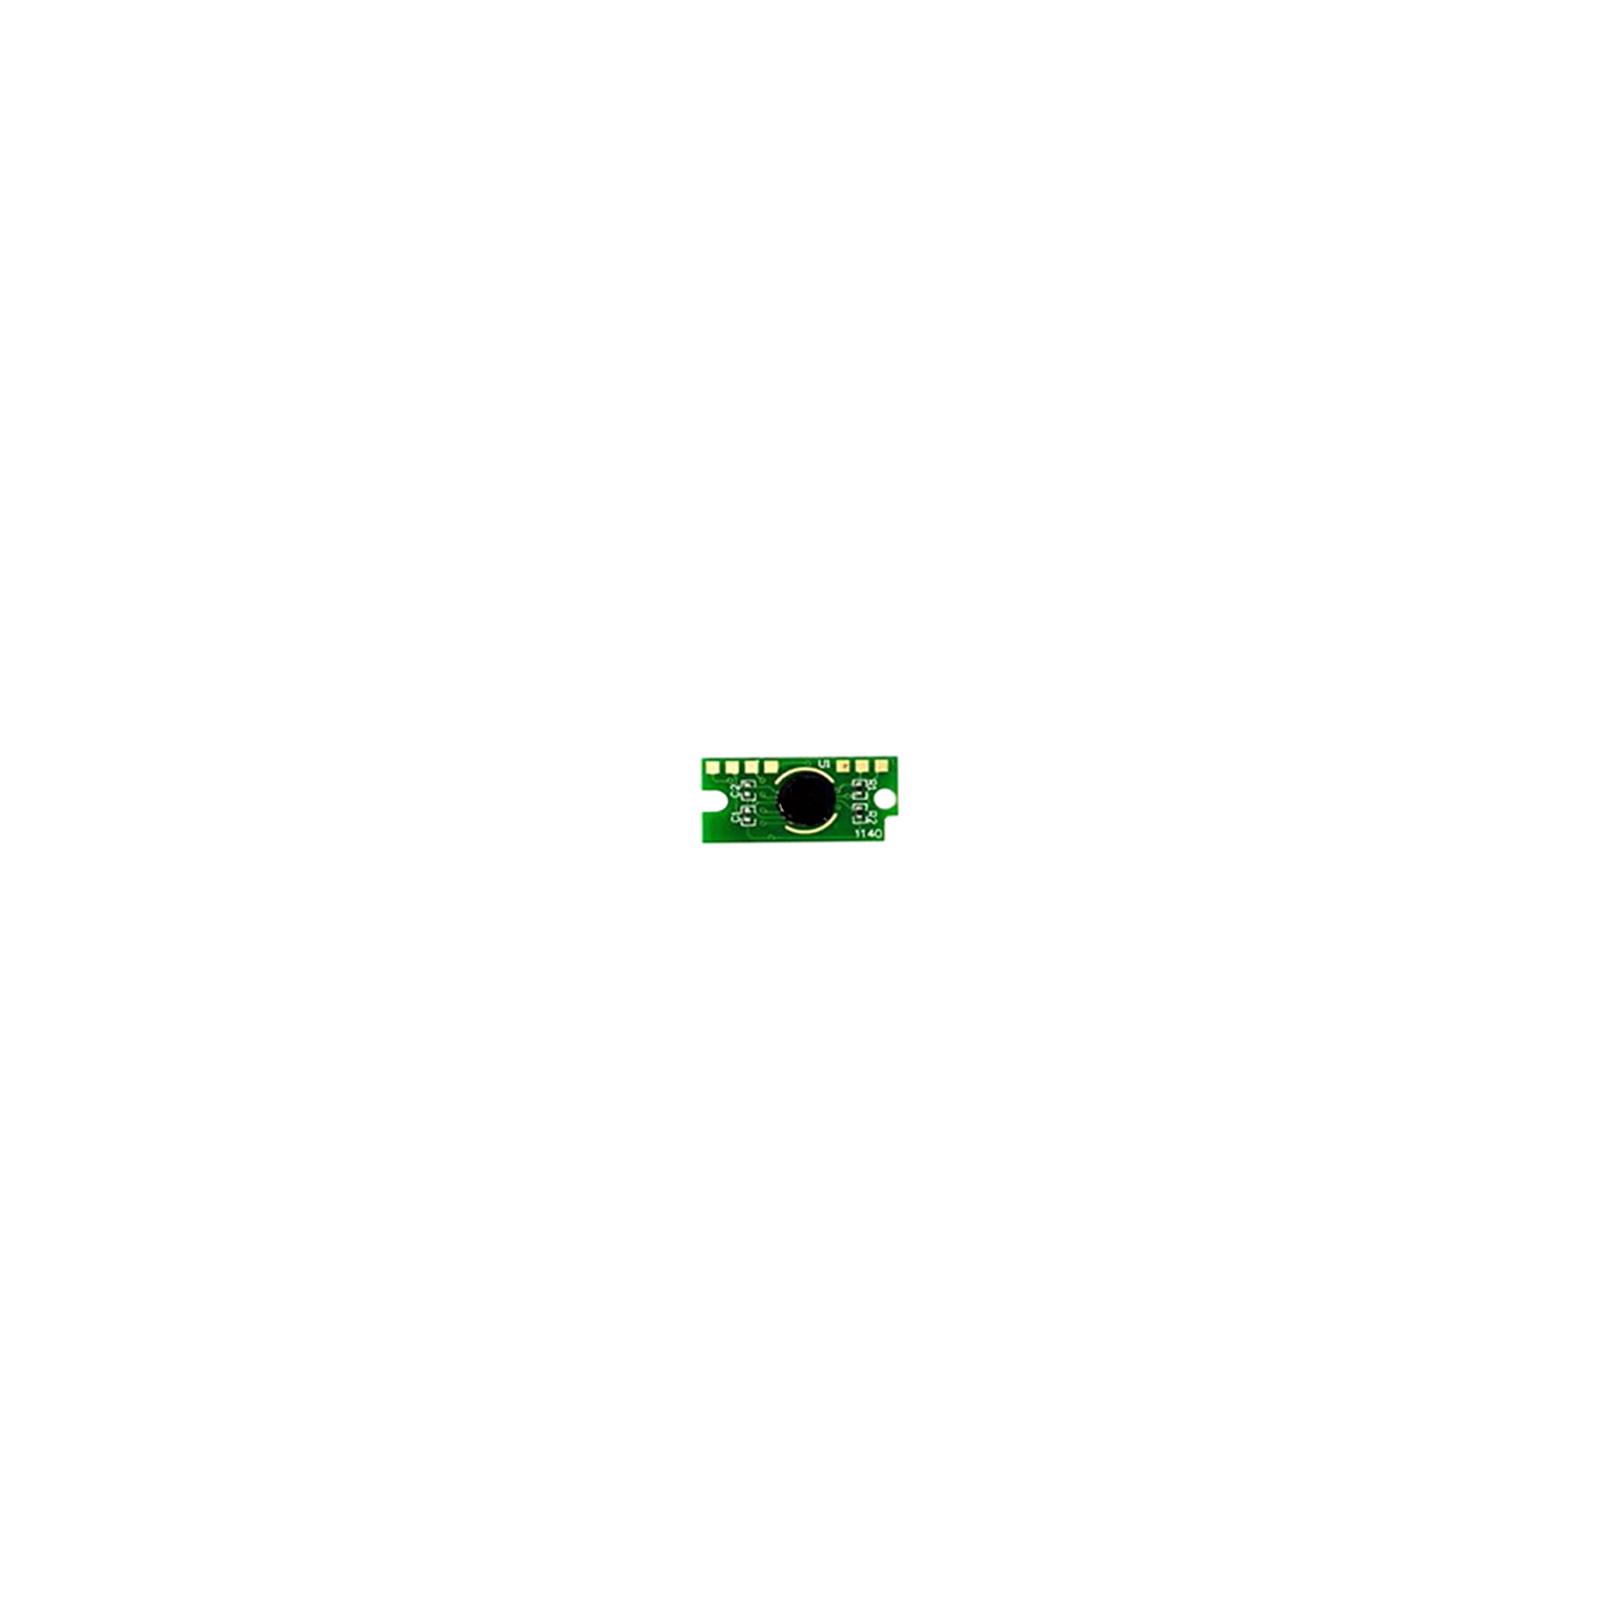 Чип для картриджа Xerox Phaser 6020 (106R02762) 1k yellow Static Control (X6020CP-YLA)